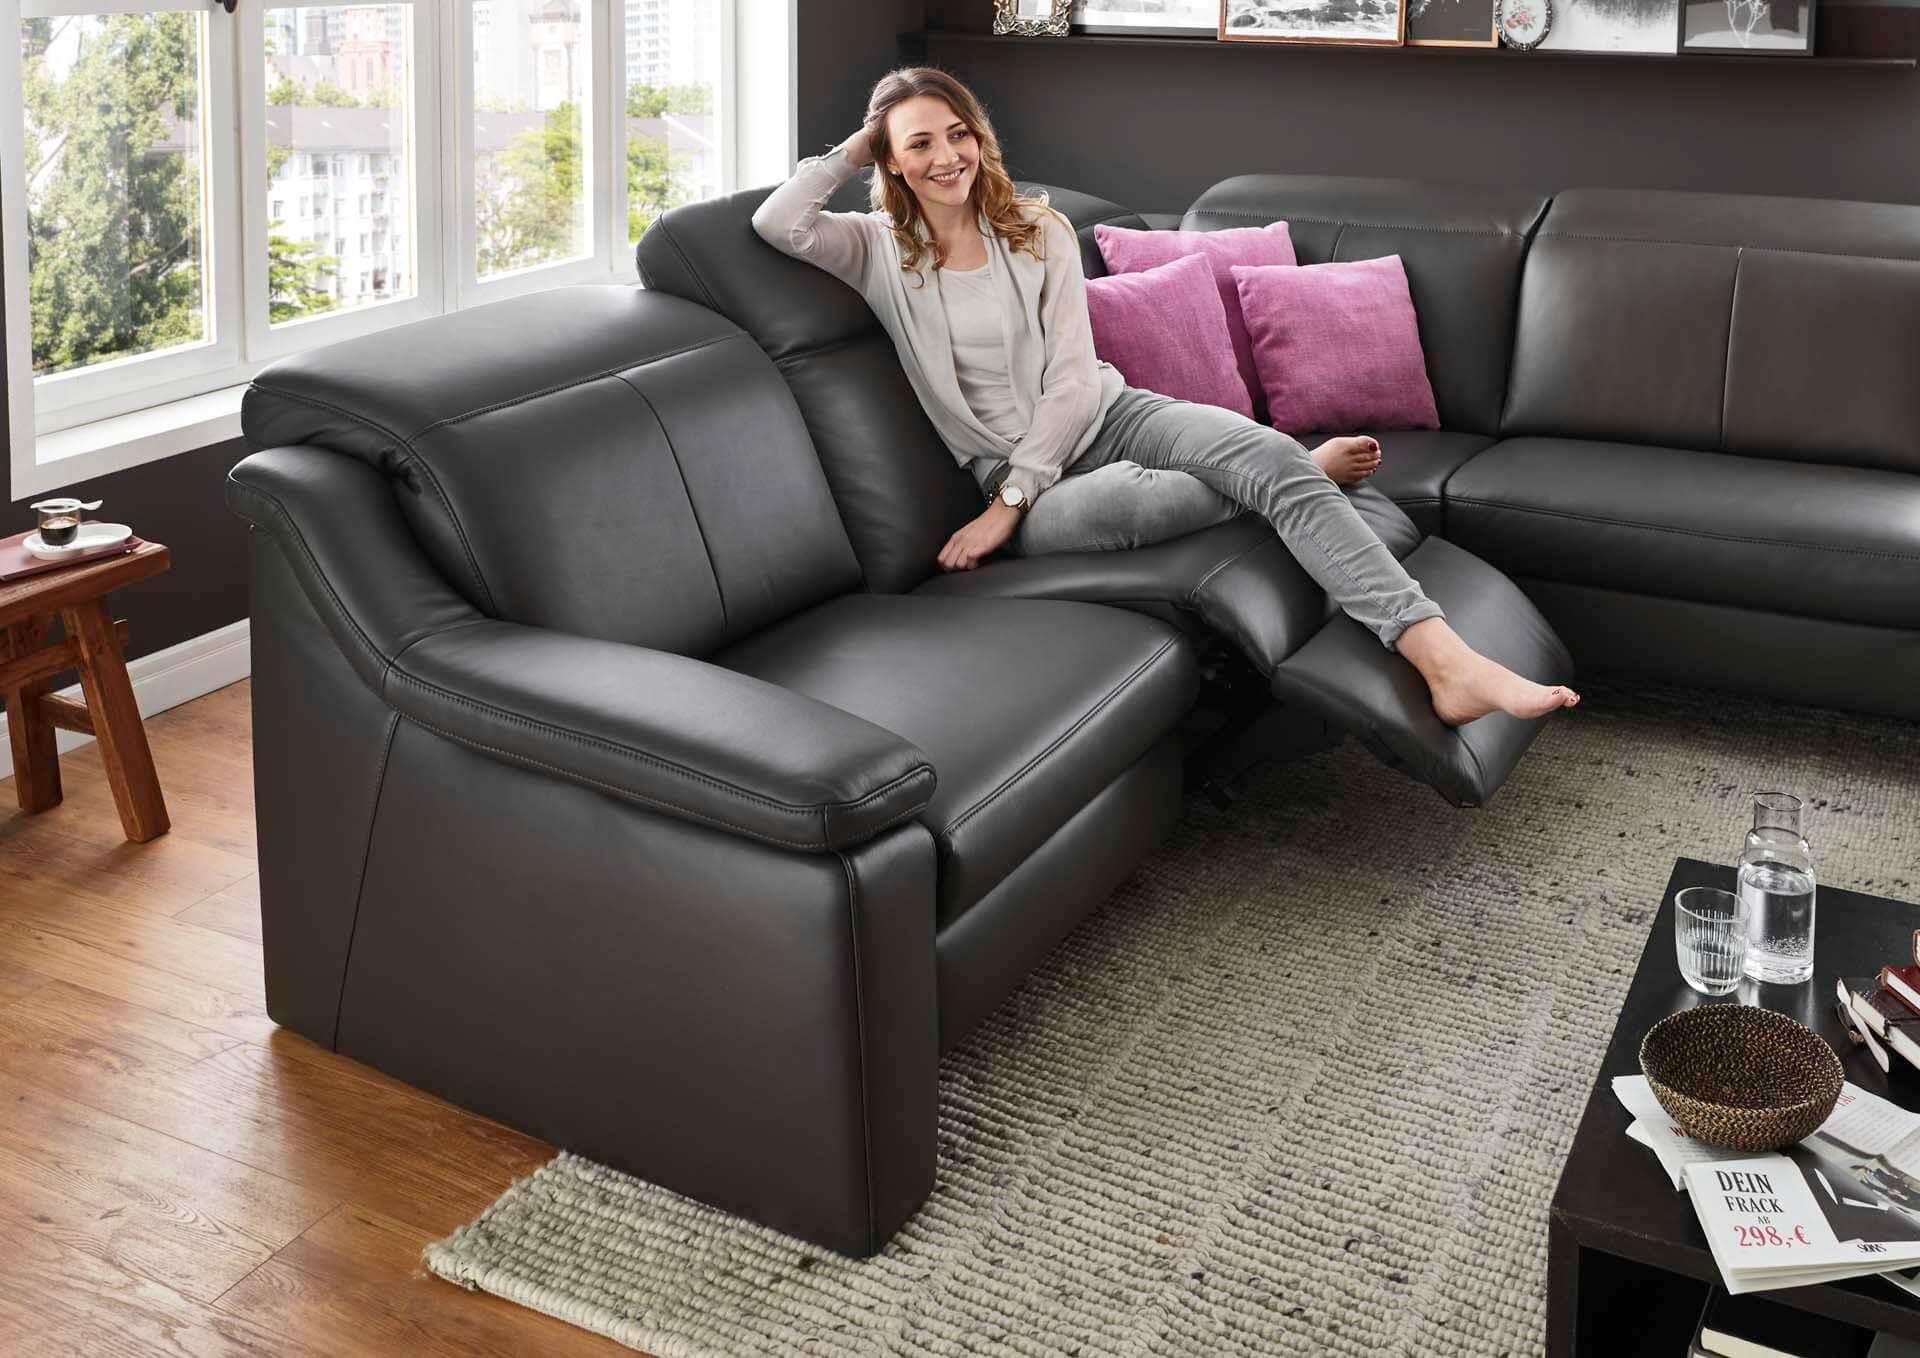 Sofa-Harlem-Com4Lux3